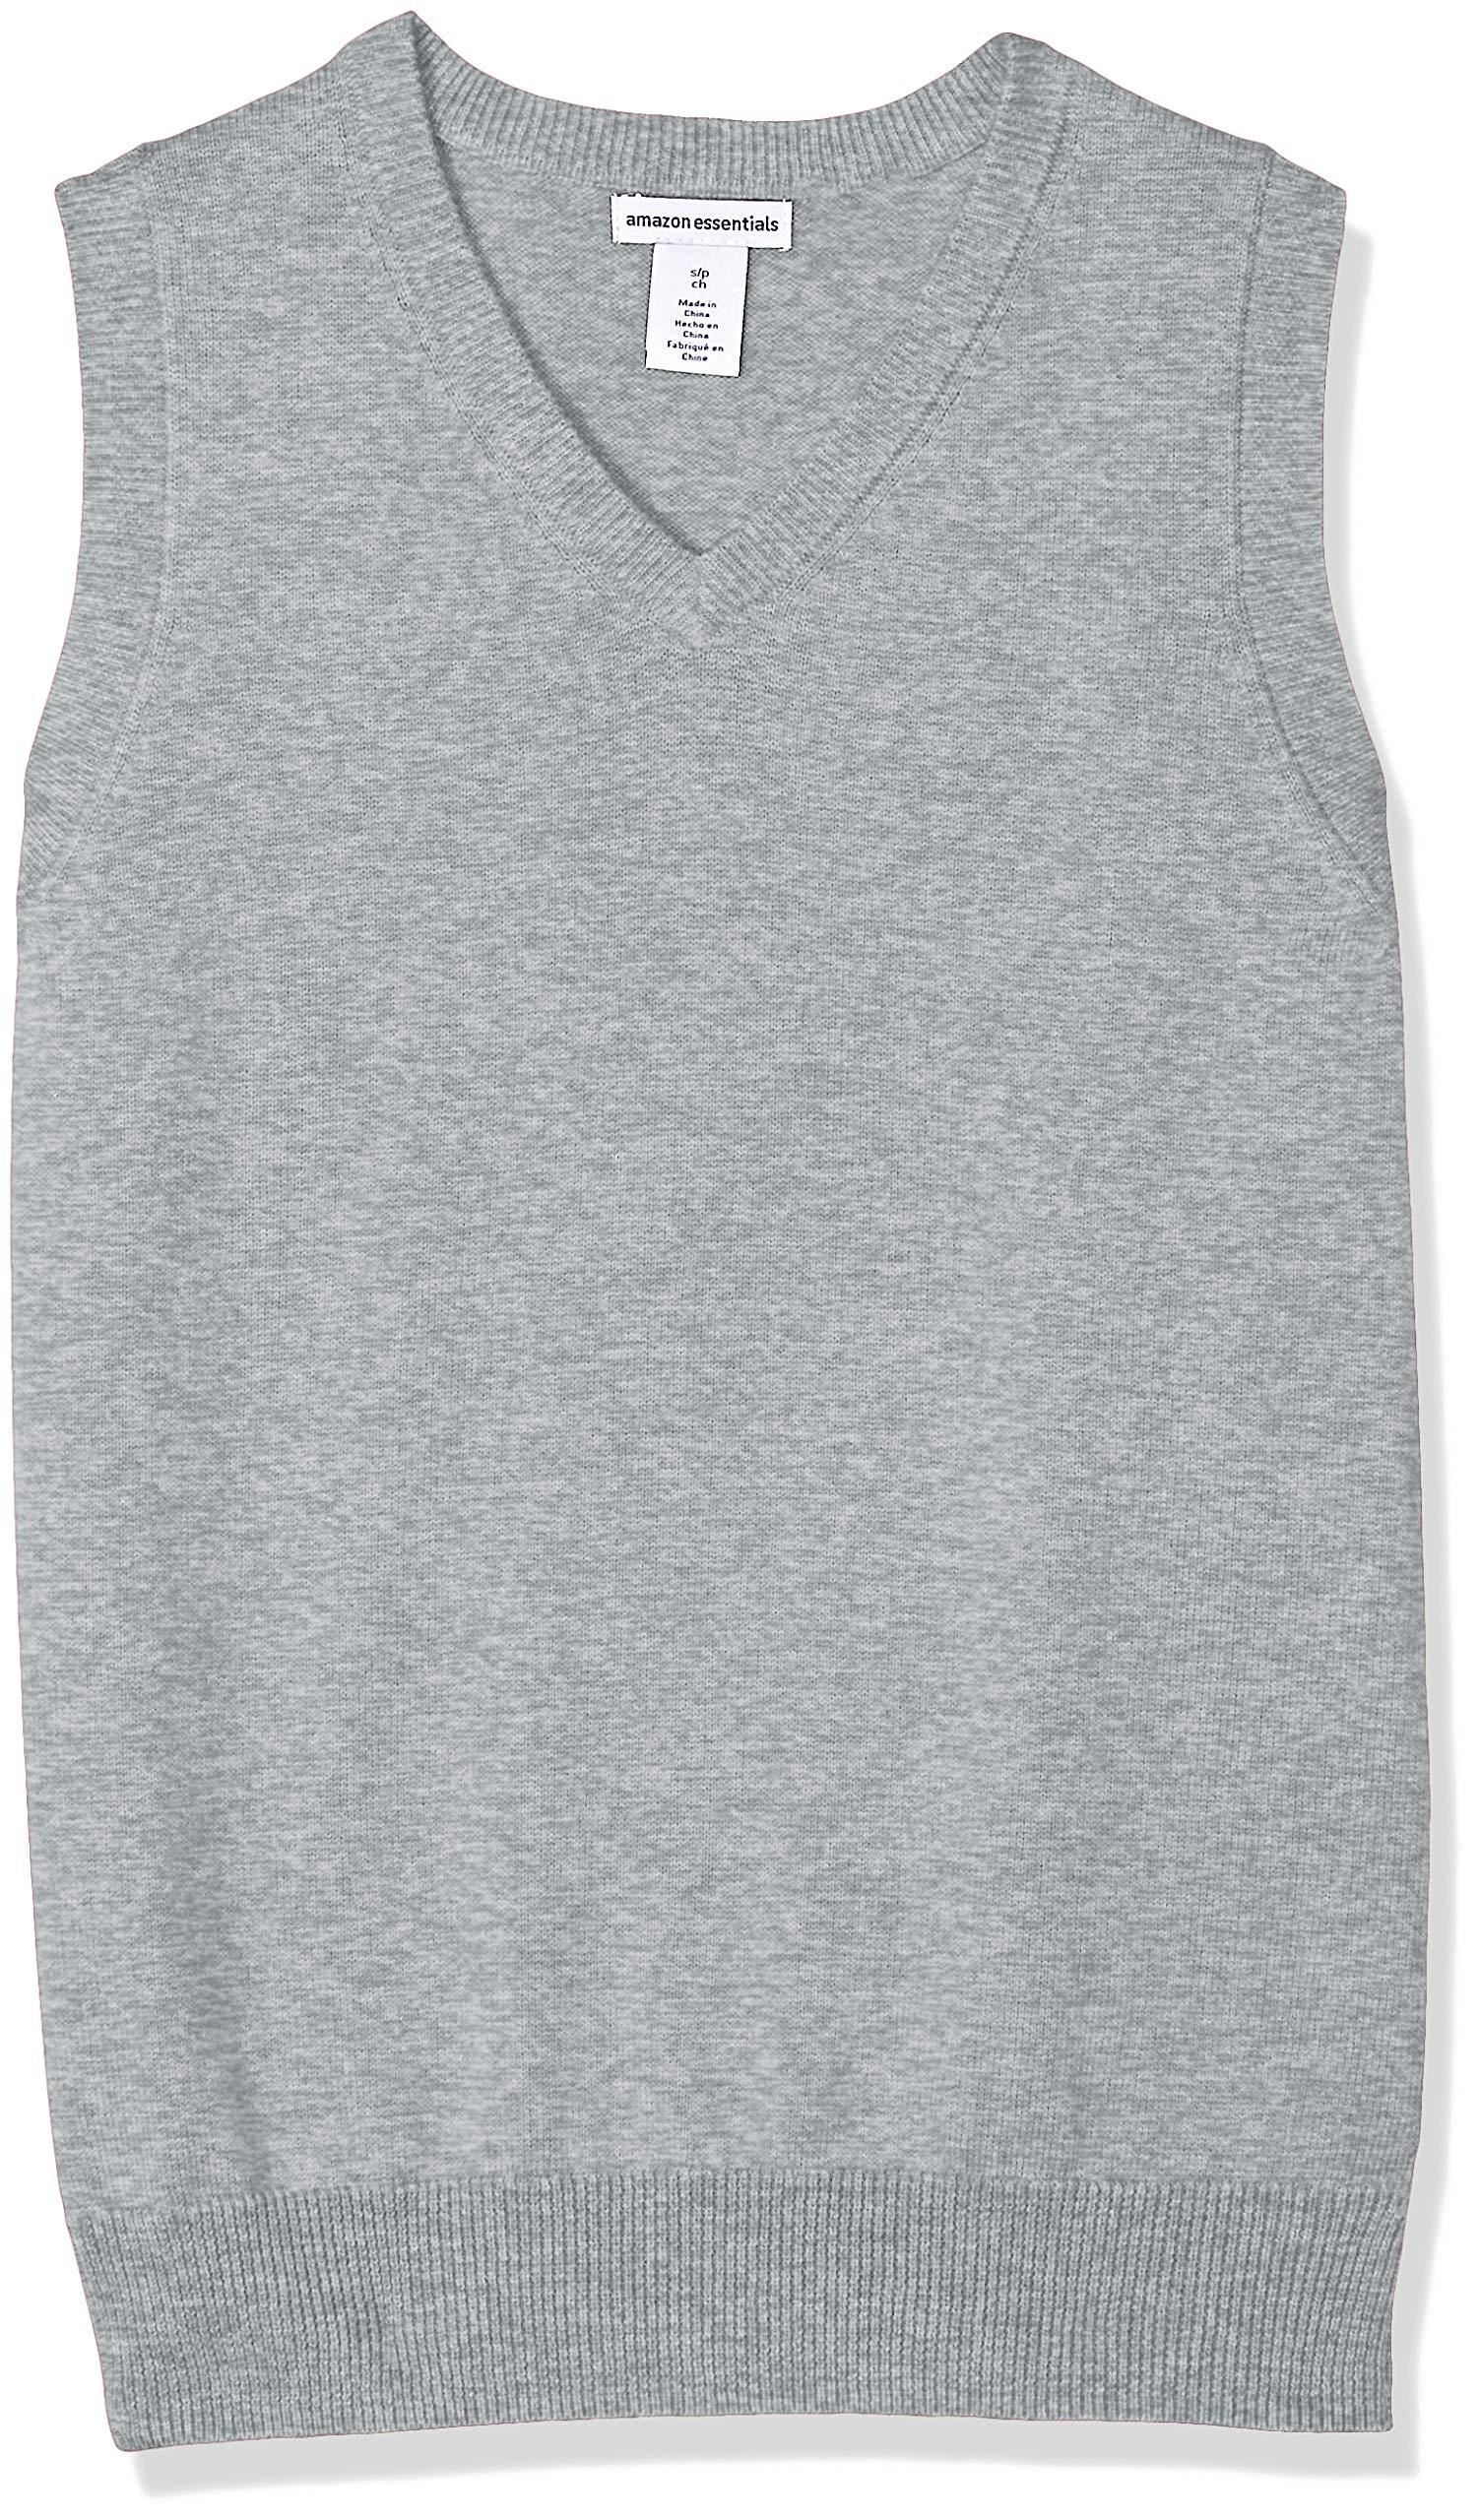 Amazon Essentials Little Boys' Uniform V-Neck Sweater Vest, Light Heather Grey, M